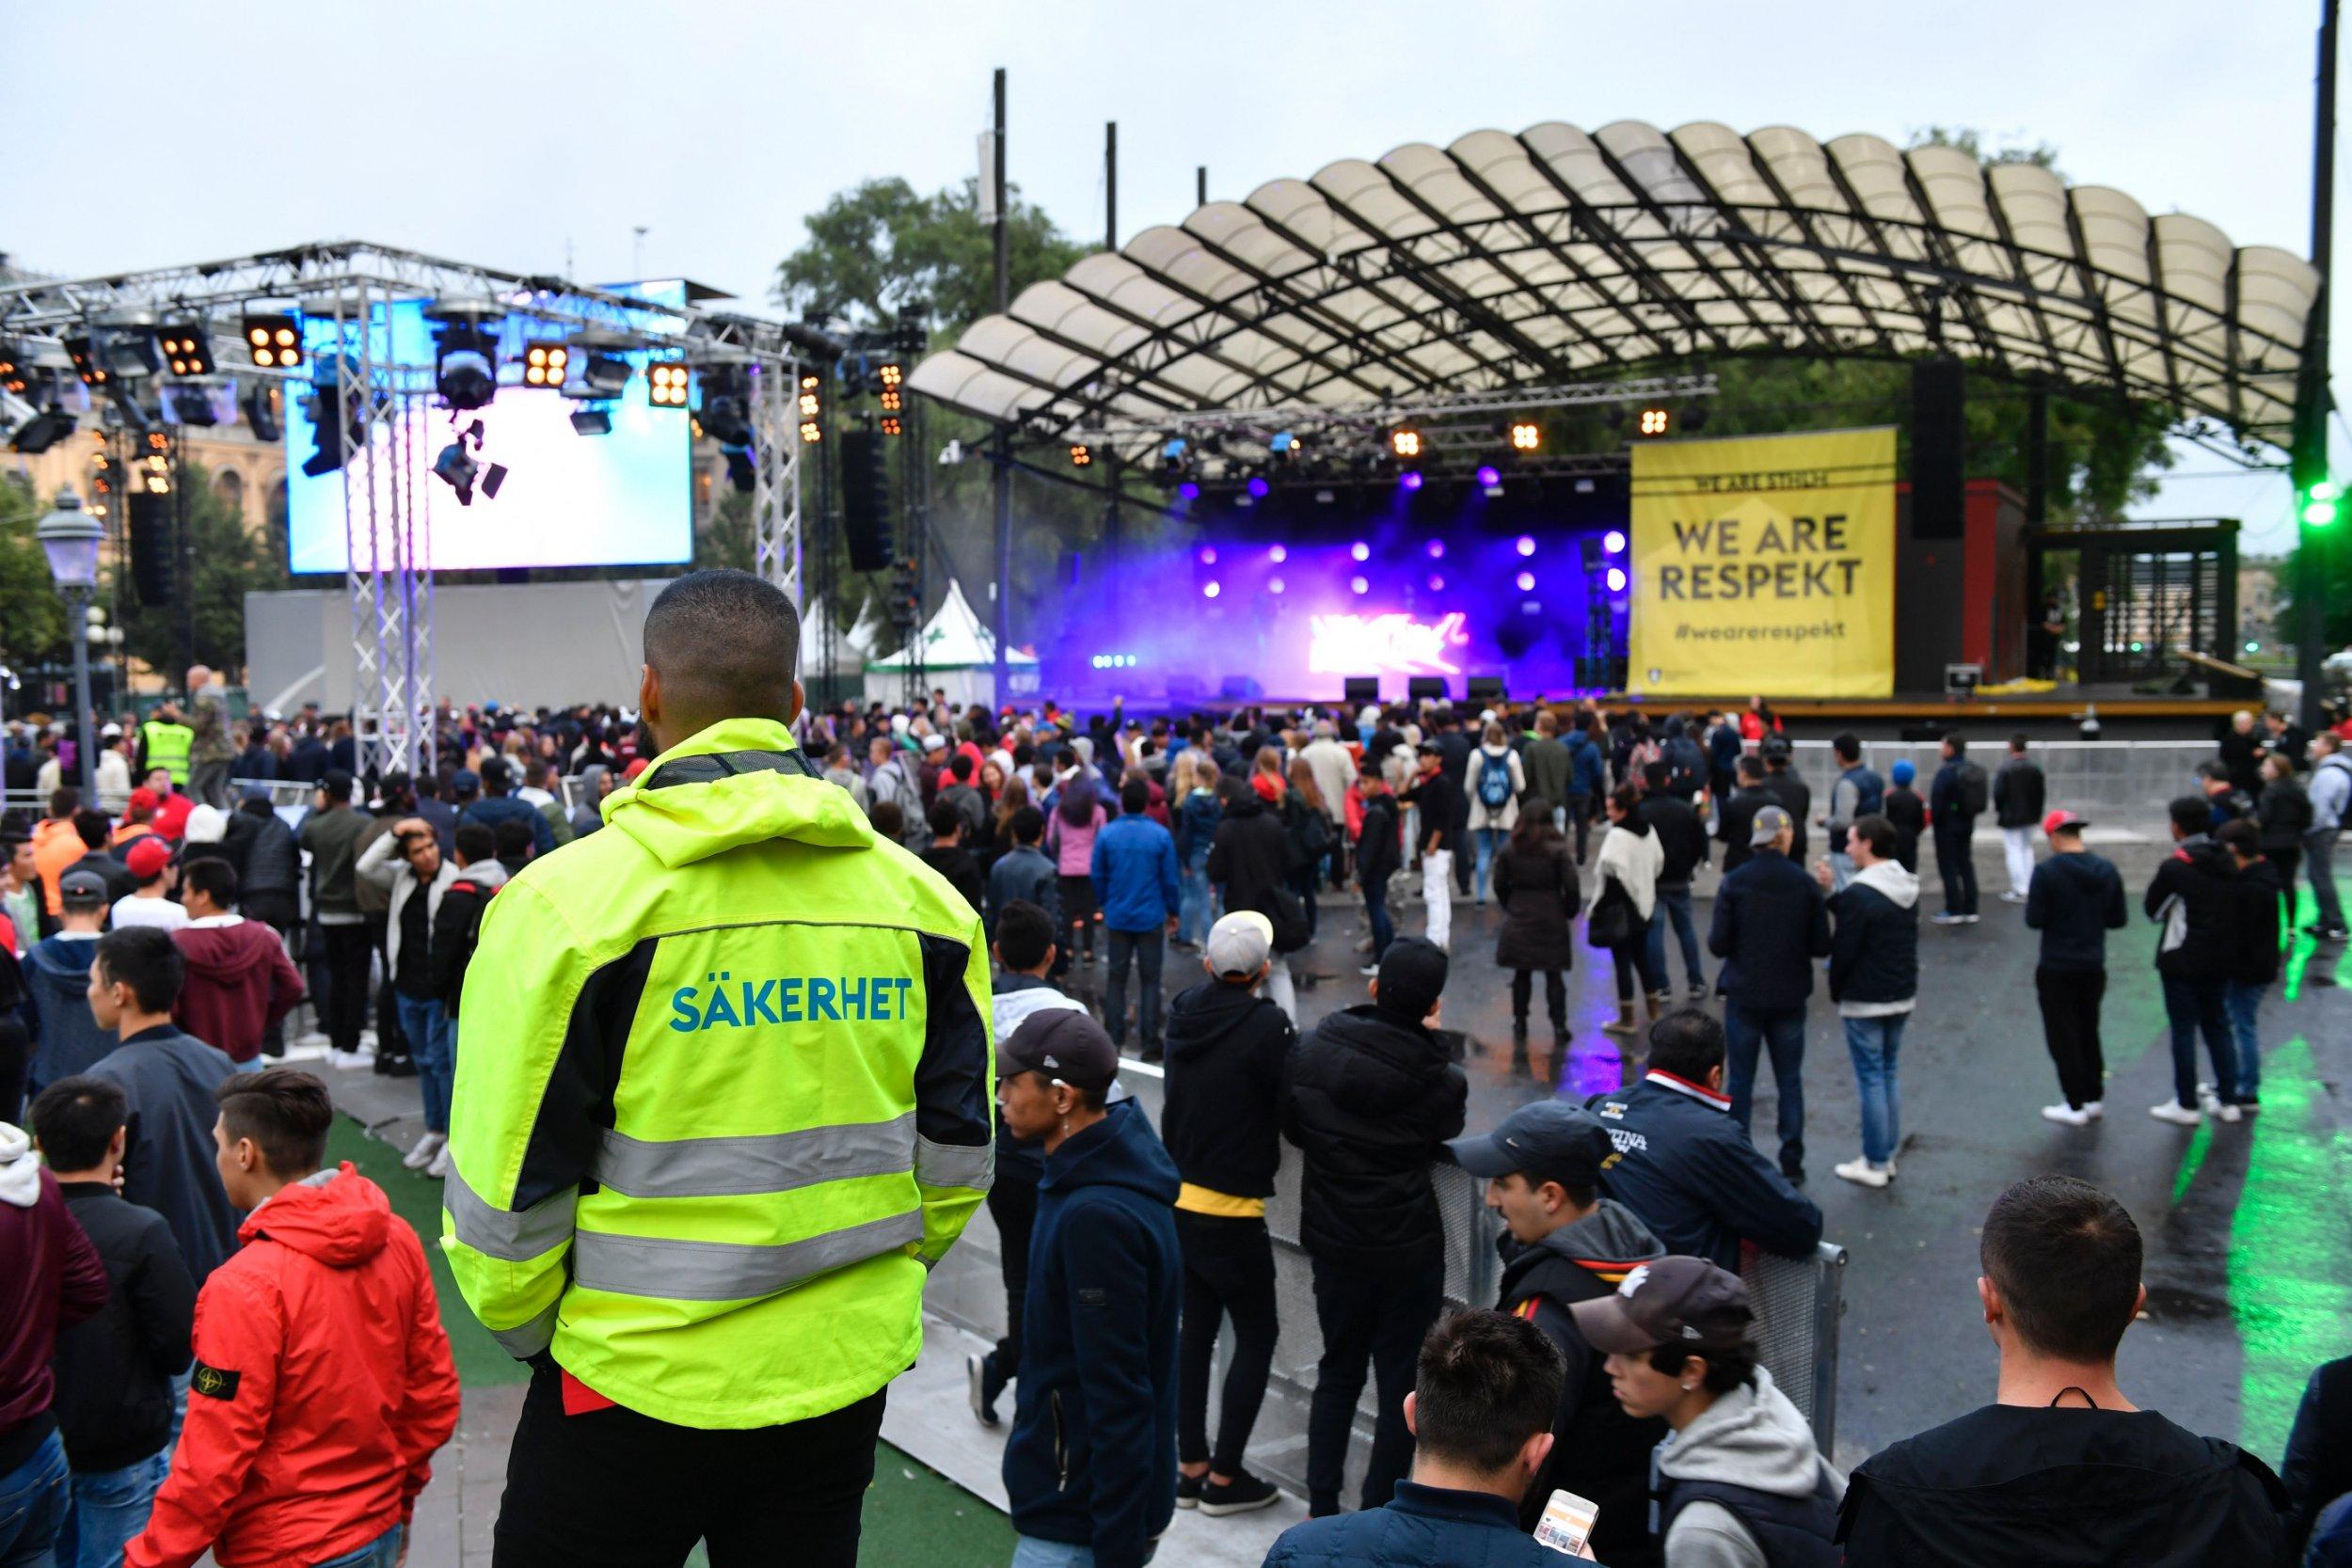 Police investigate 38 sex assault allegations at Swedish music festival